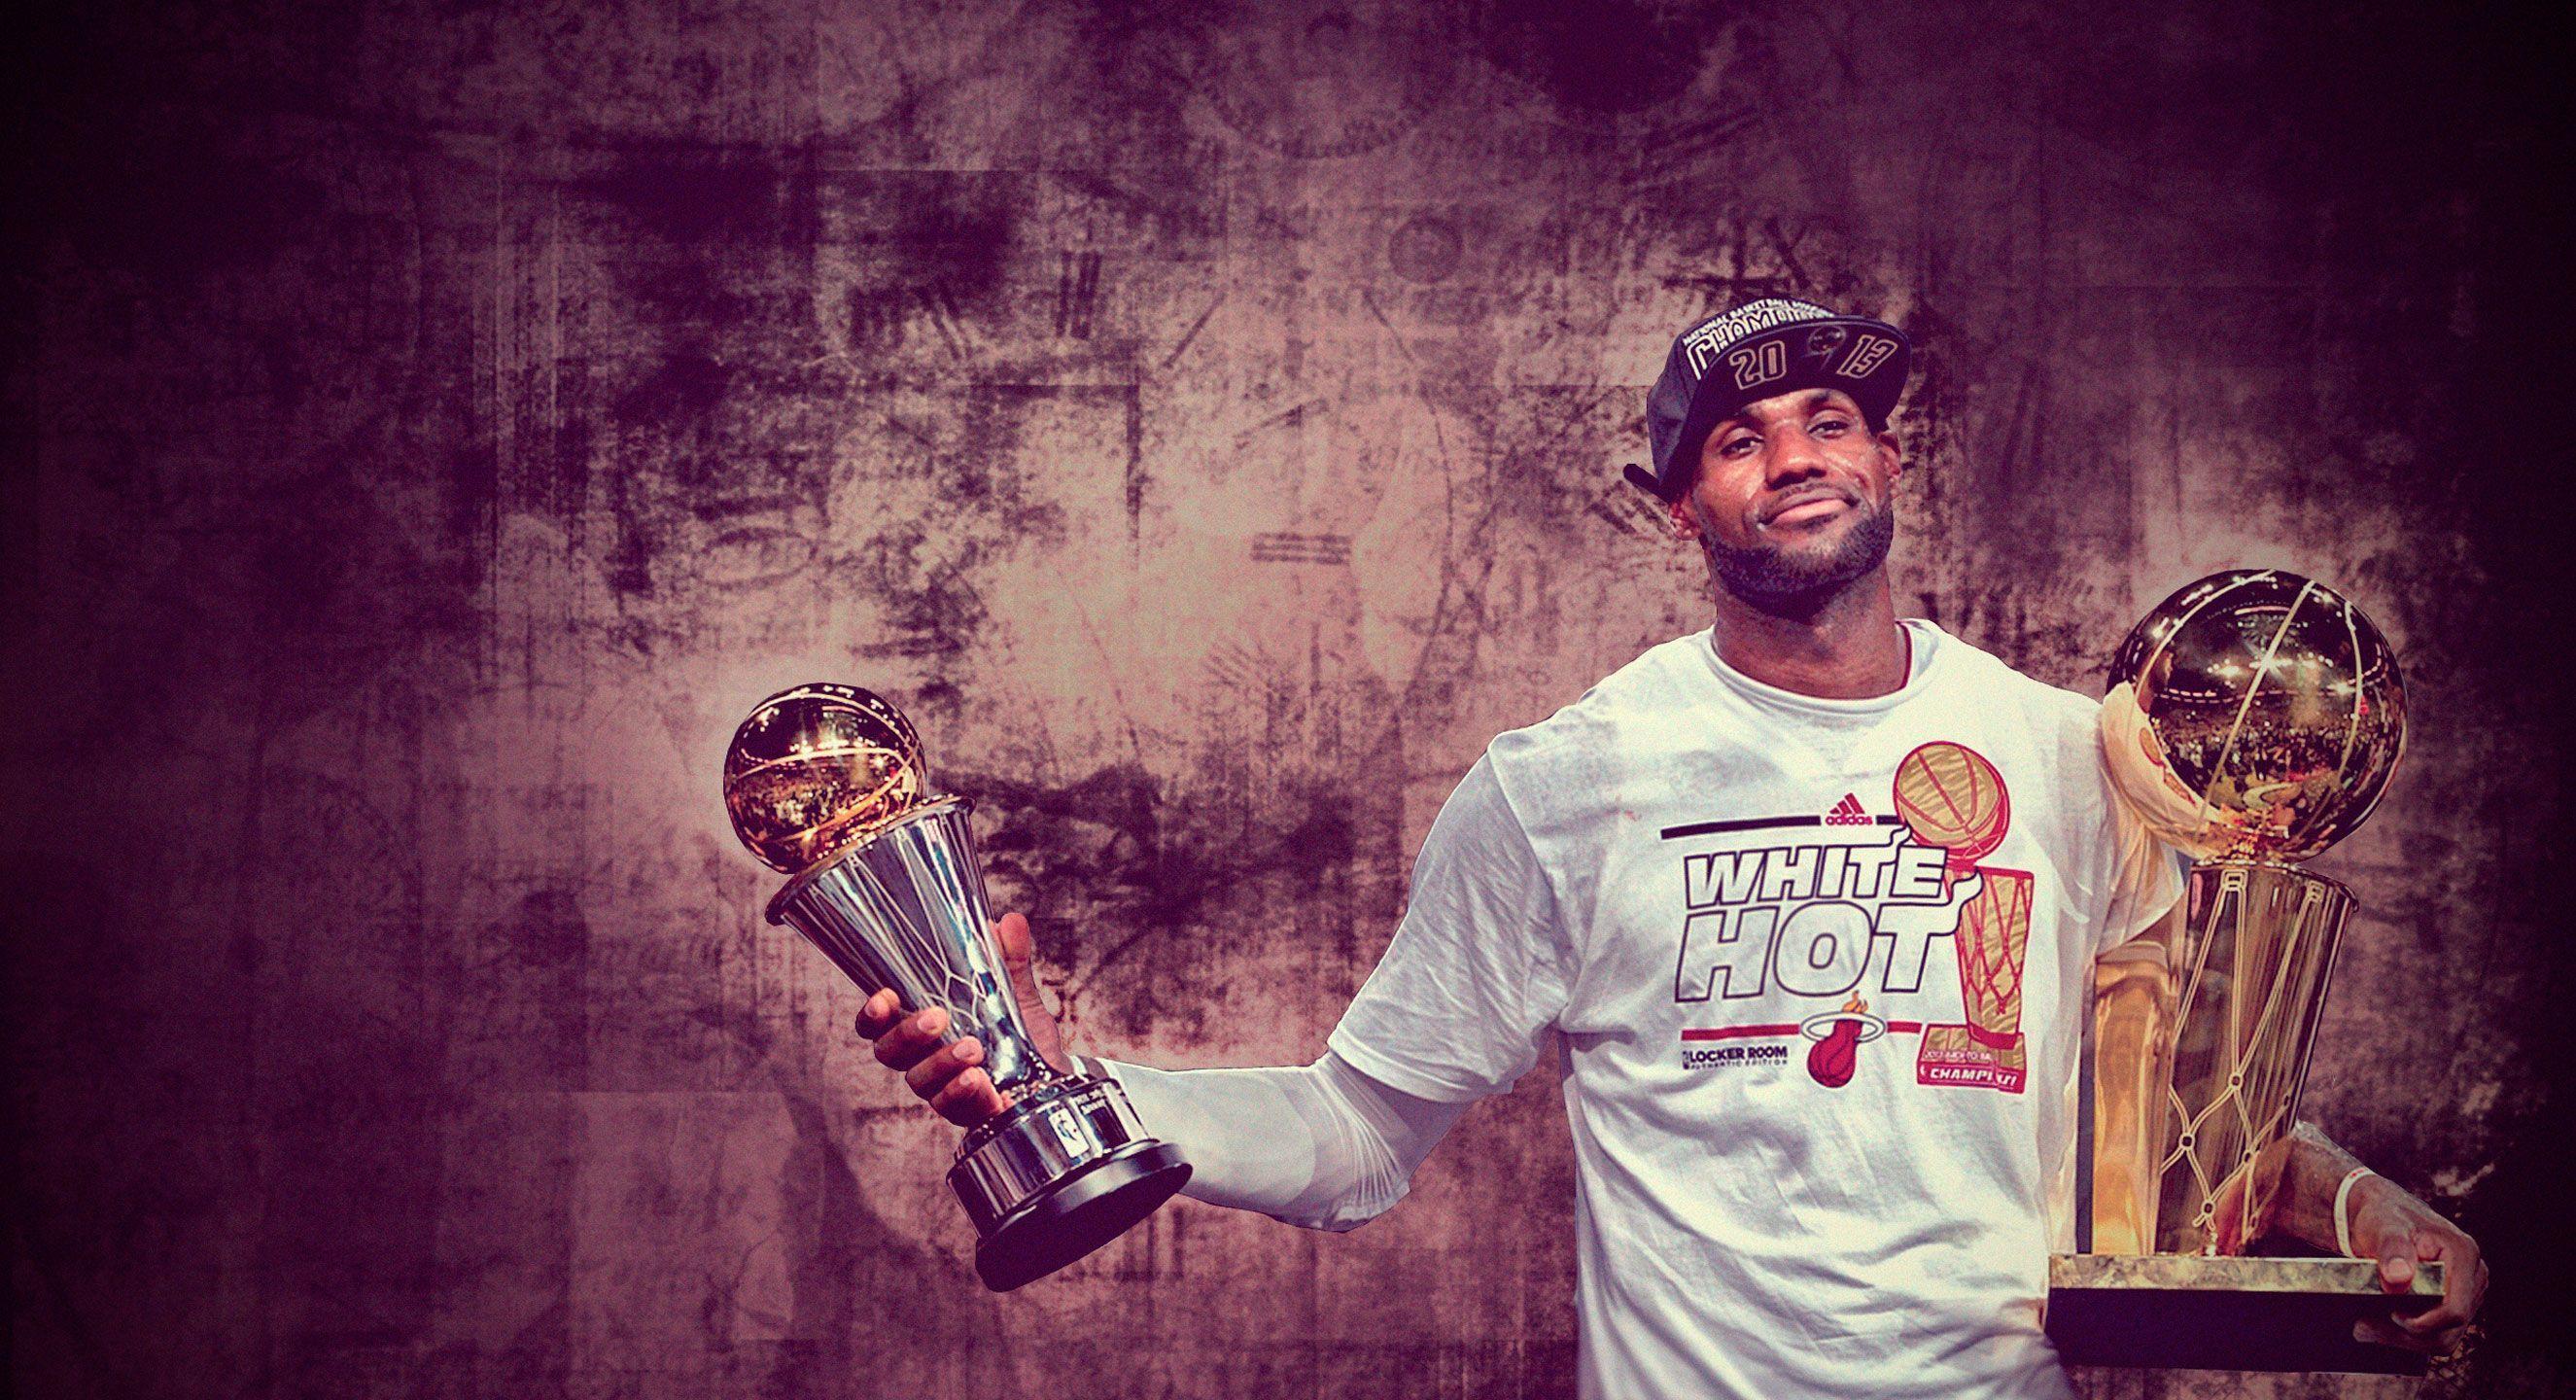 LeBron James MVP Wallpapers 2016